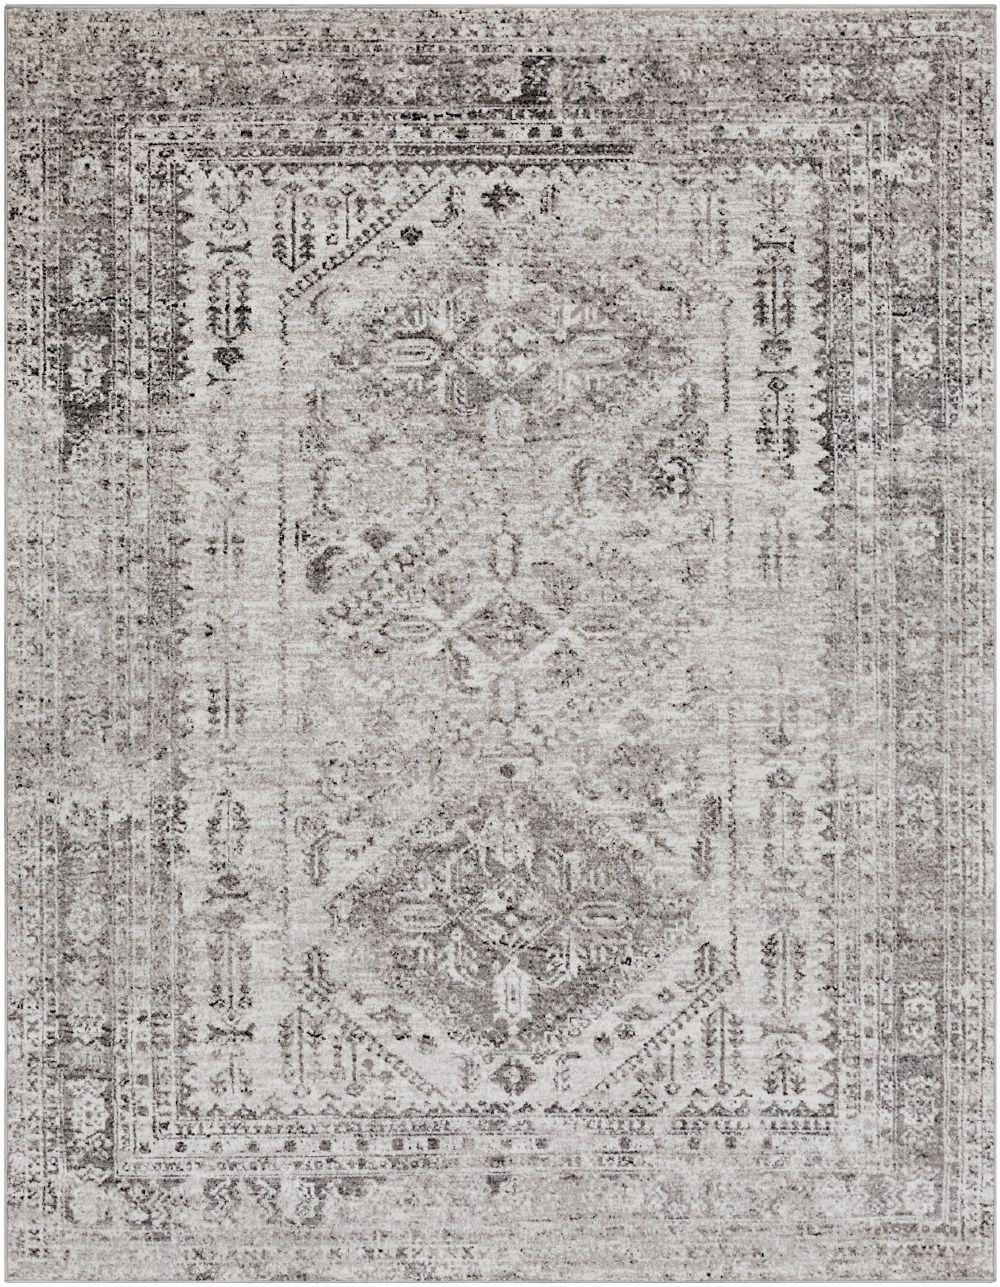 surya monte carlo traditional area rug collection